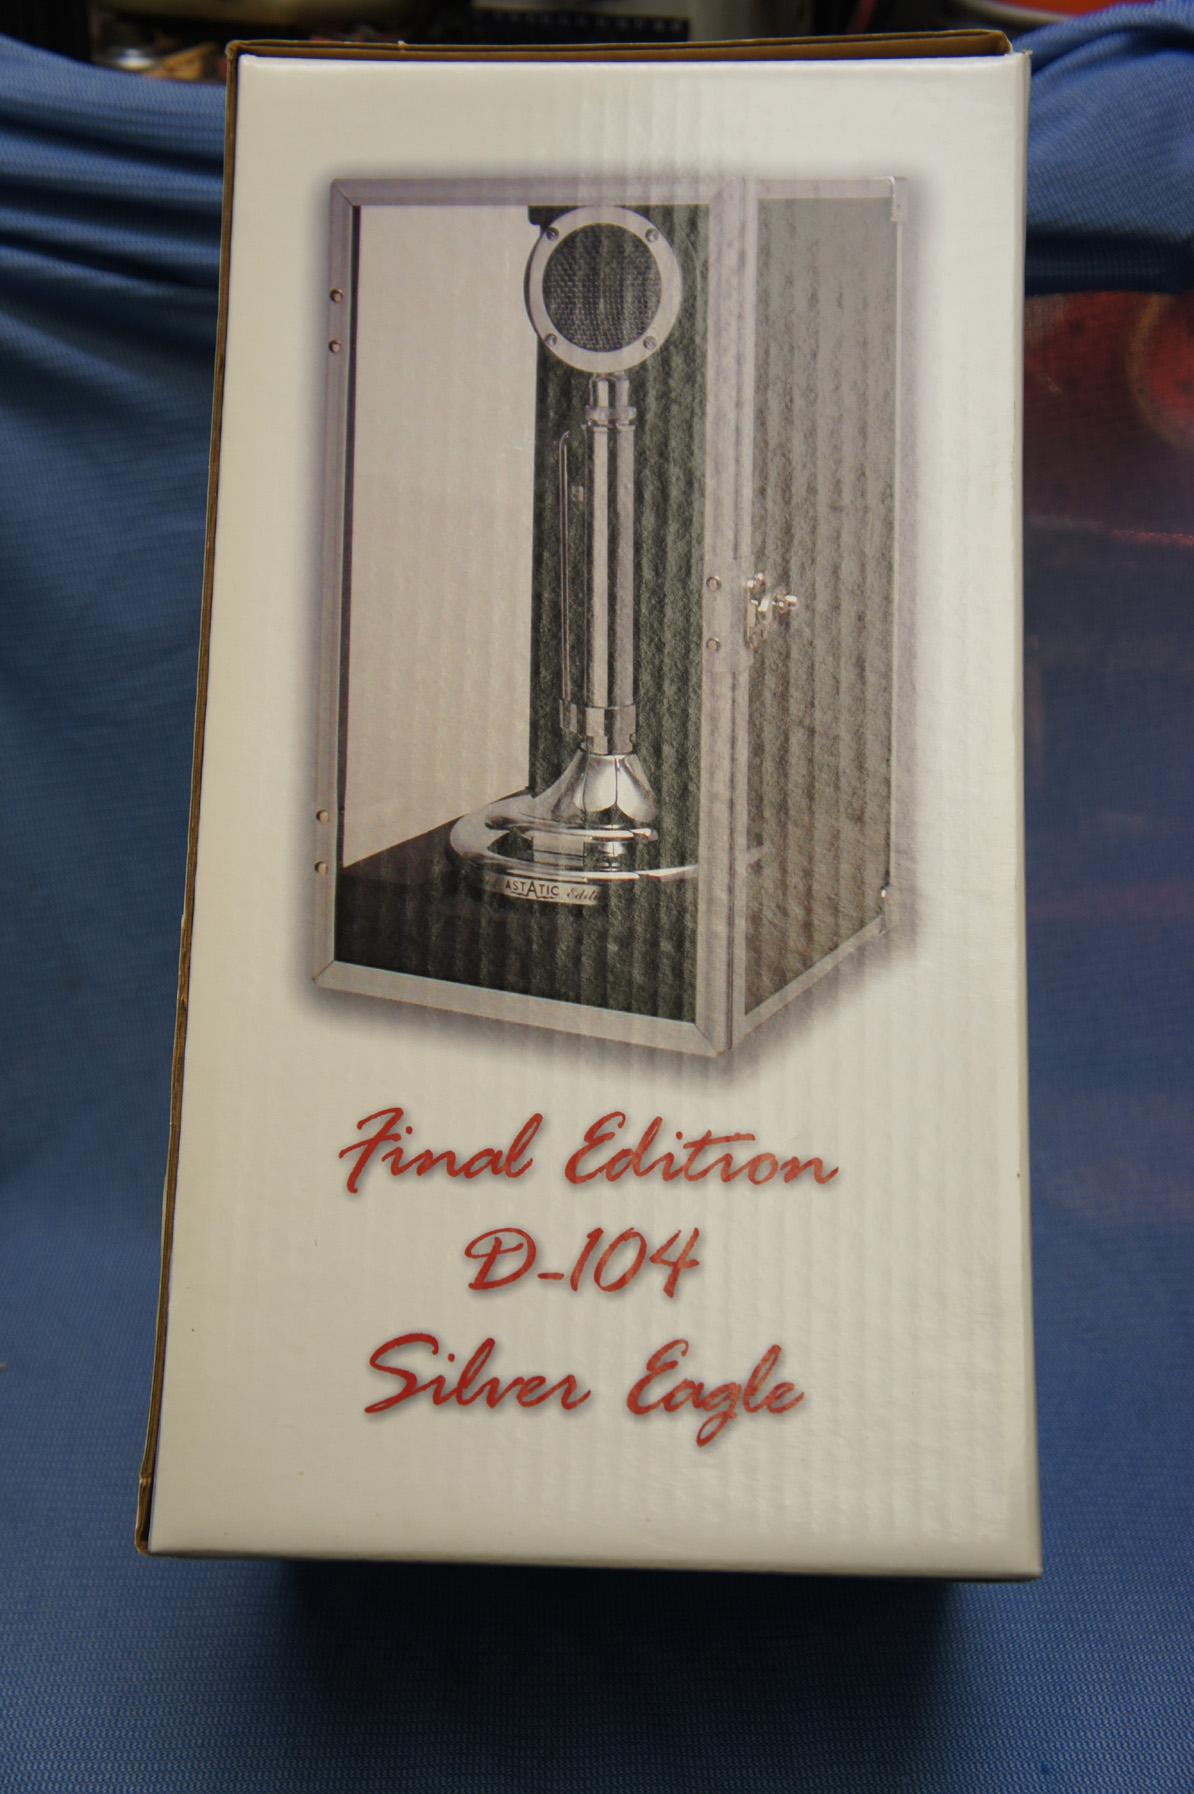 hight resolution of  http www rrcom com sales camera jpg astatic final edition silver eagle